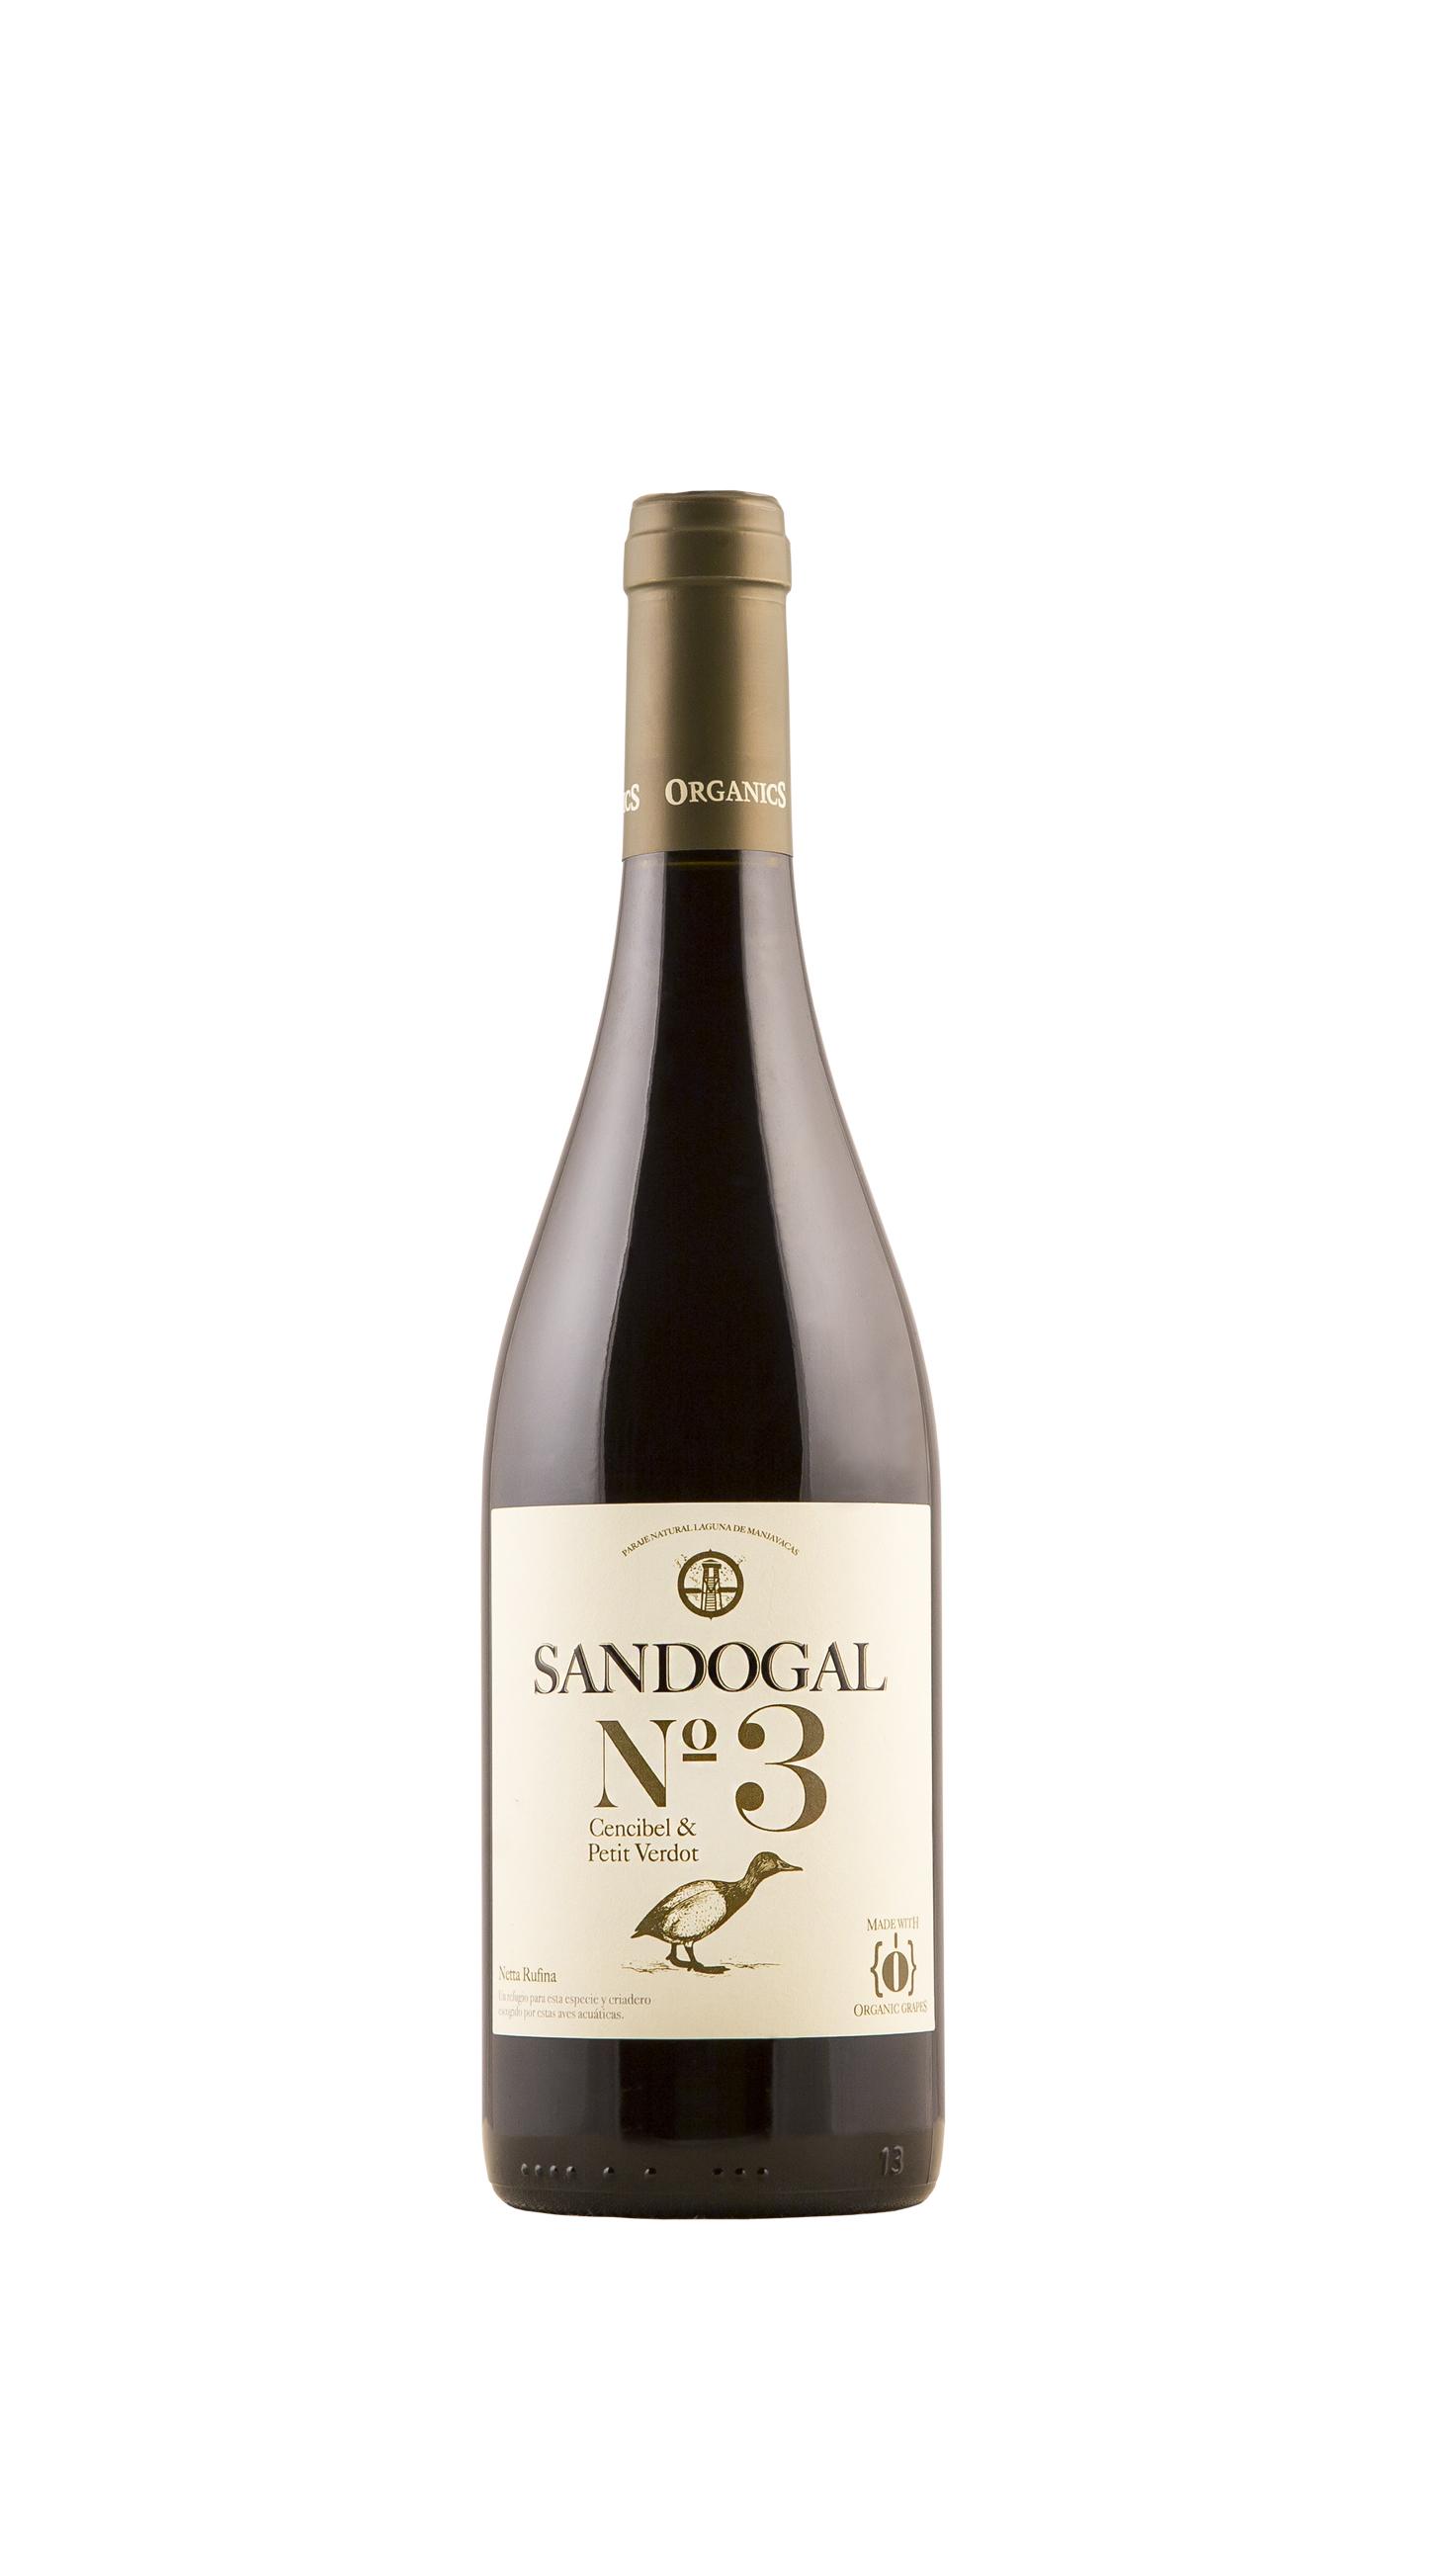 Sandogal